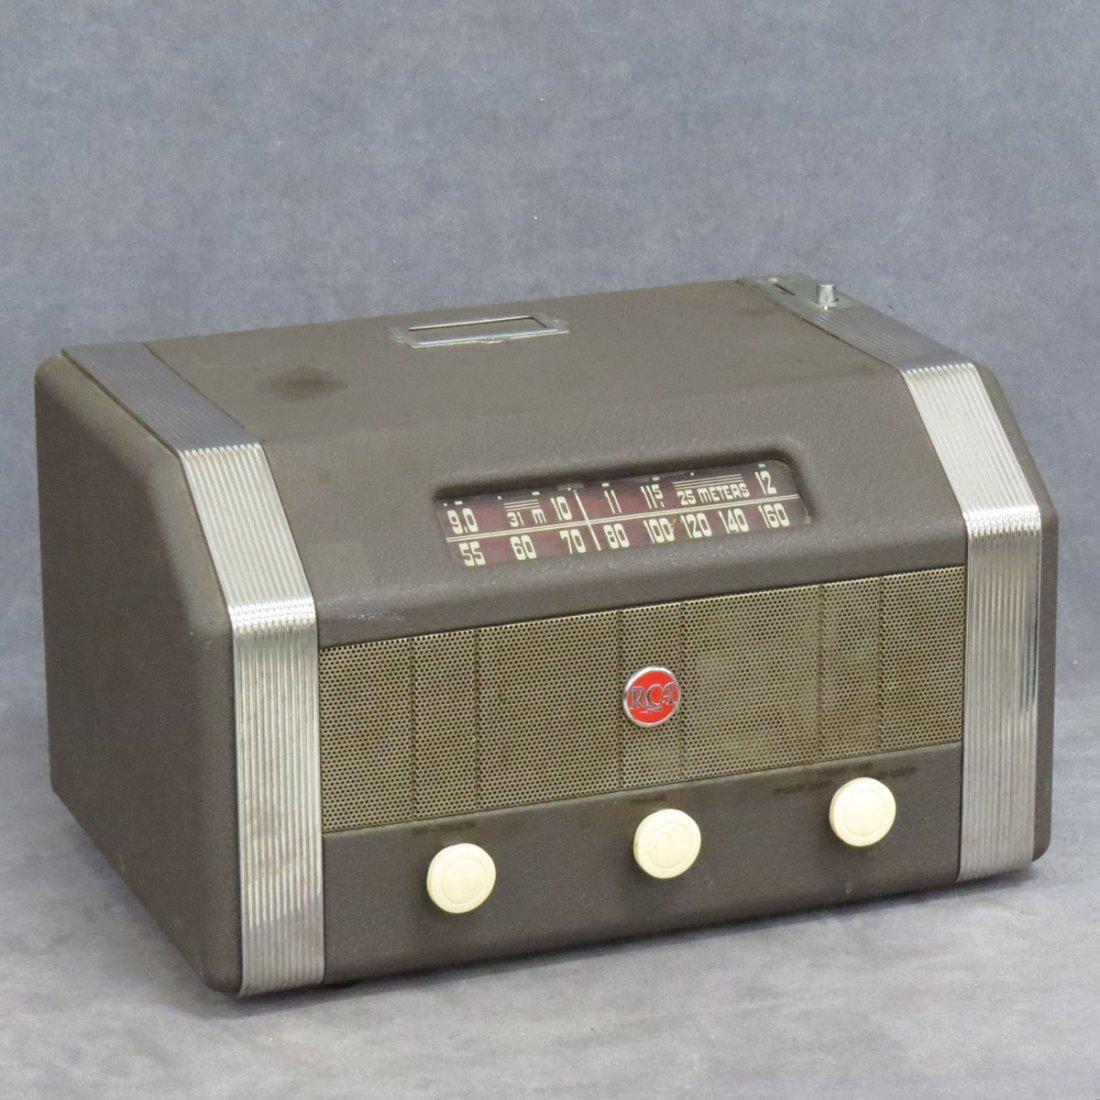 RCA MODEL MI-13174 COIN OPERATED RADIO